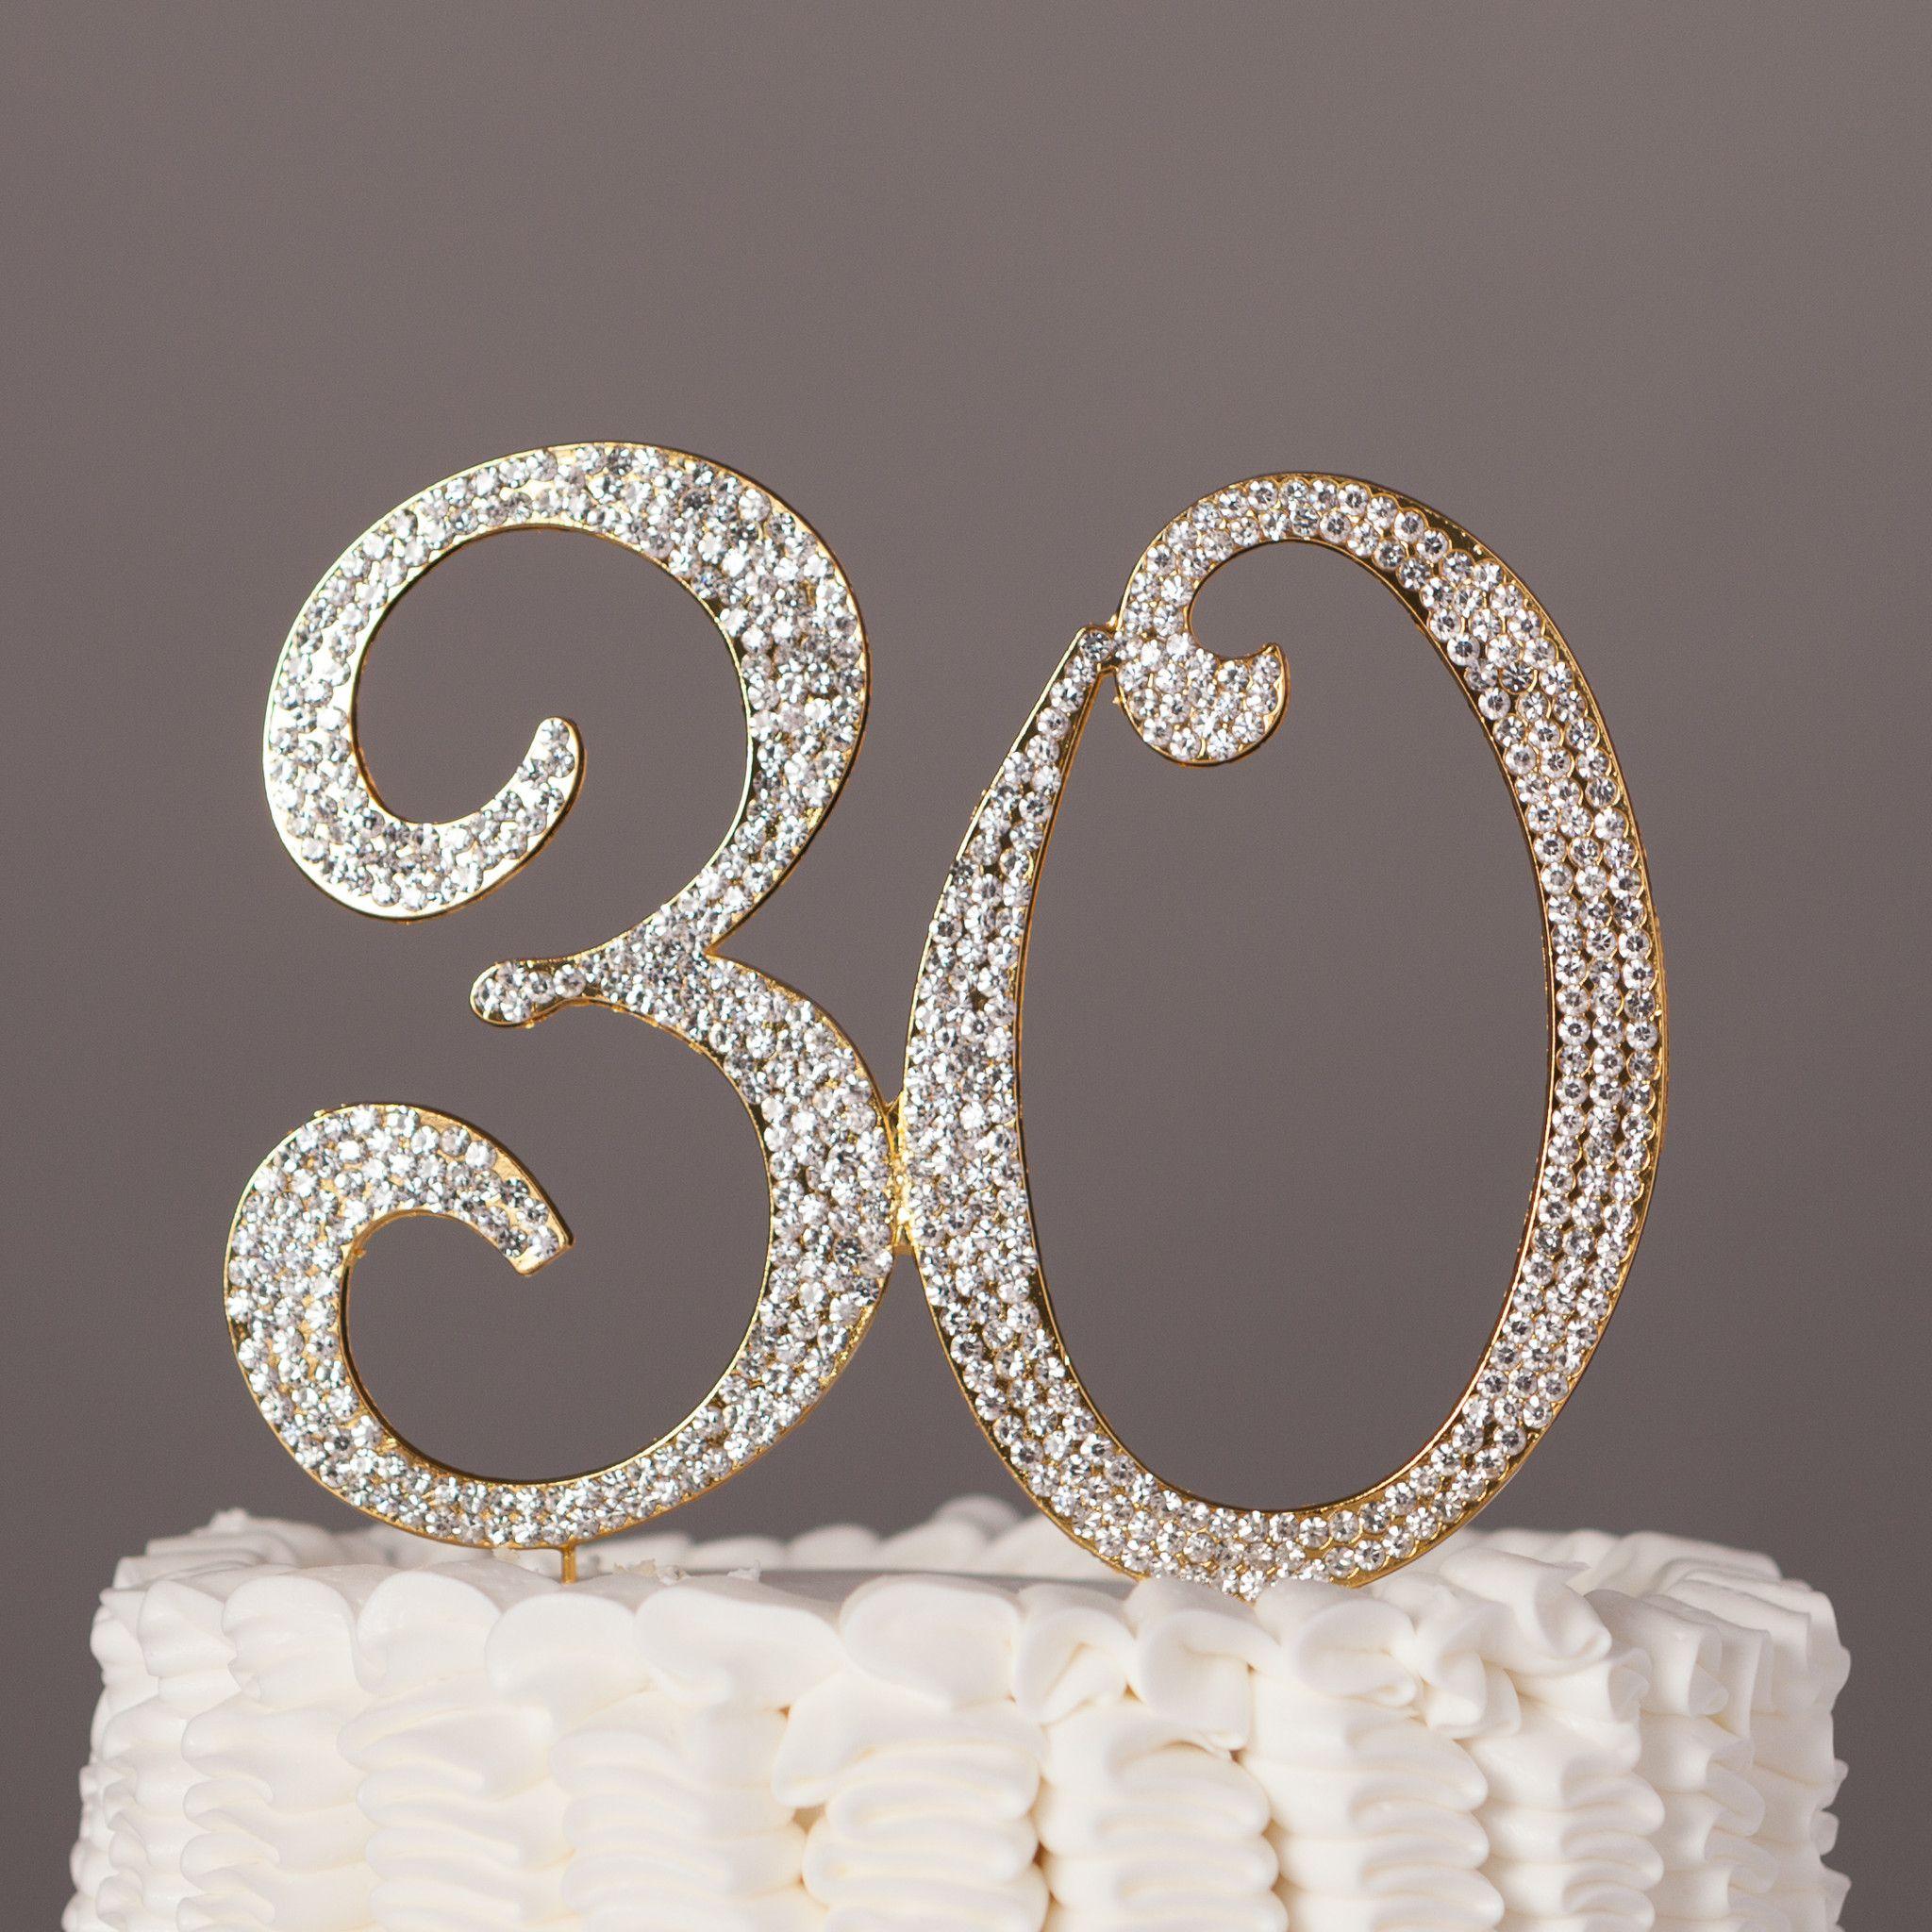 30 Cake Topper Gold